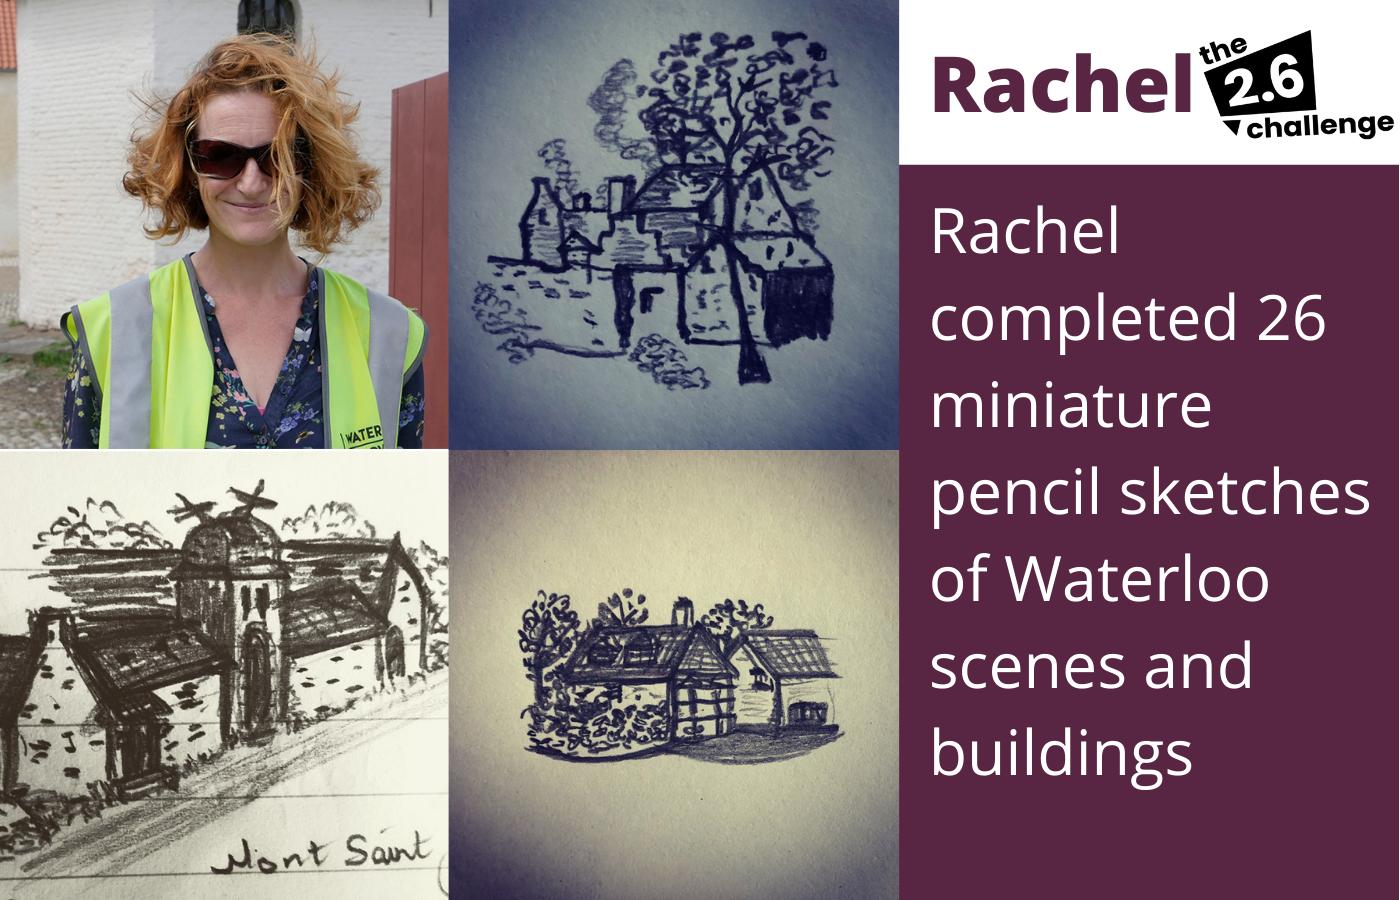 Rachel title card